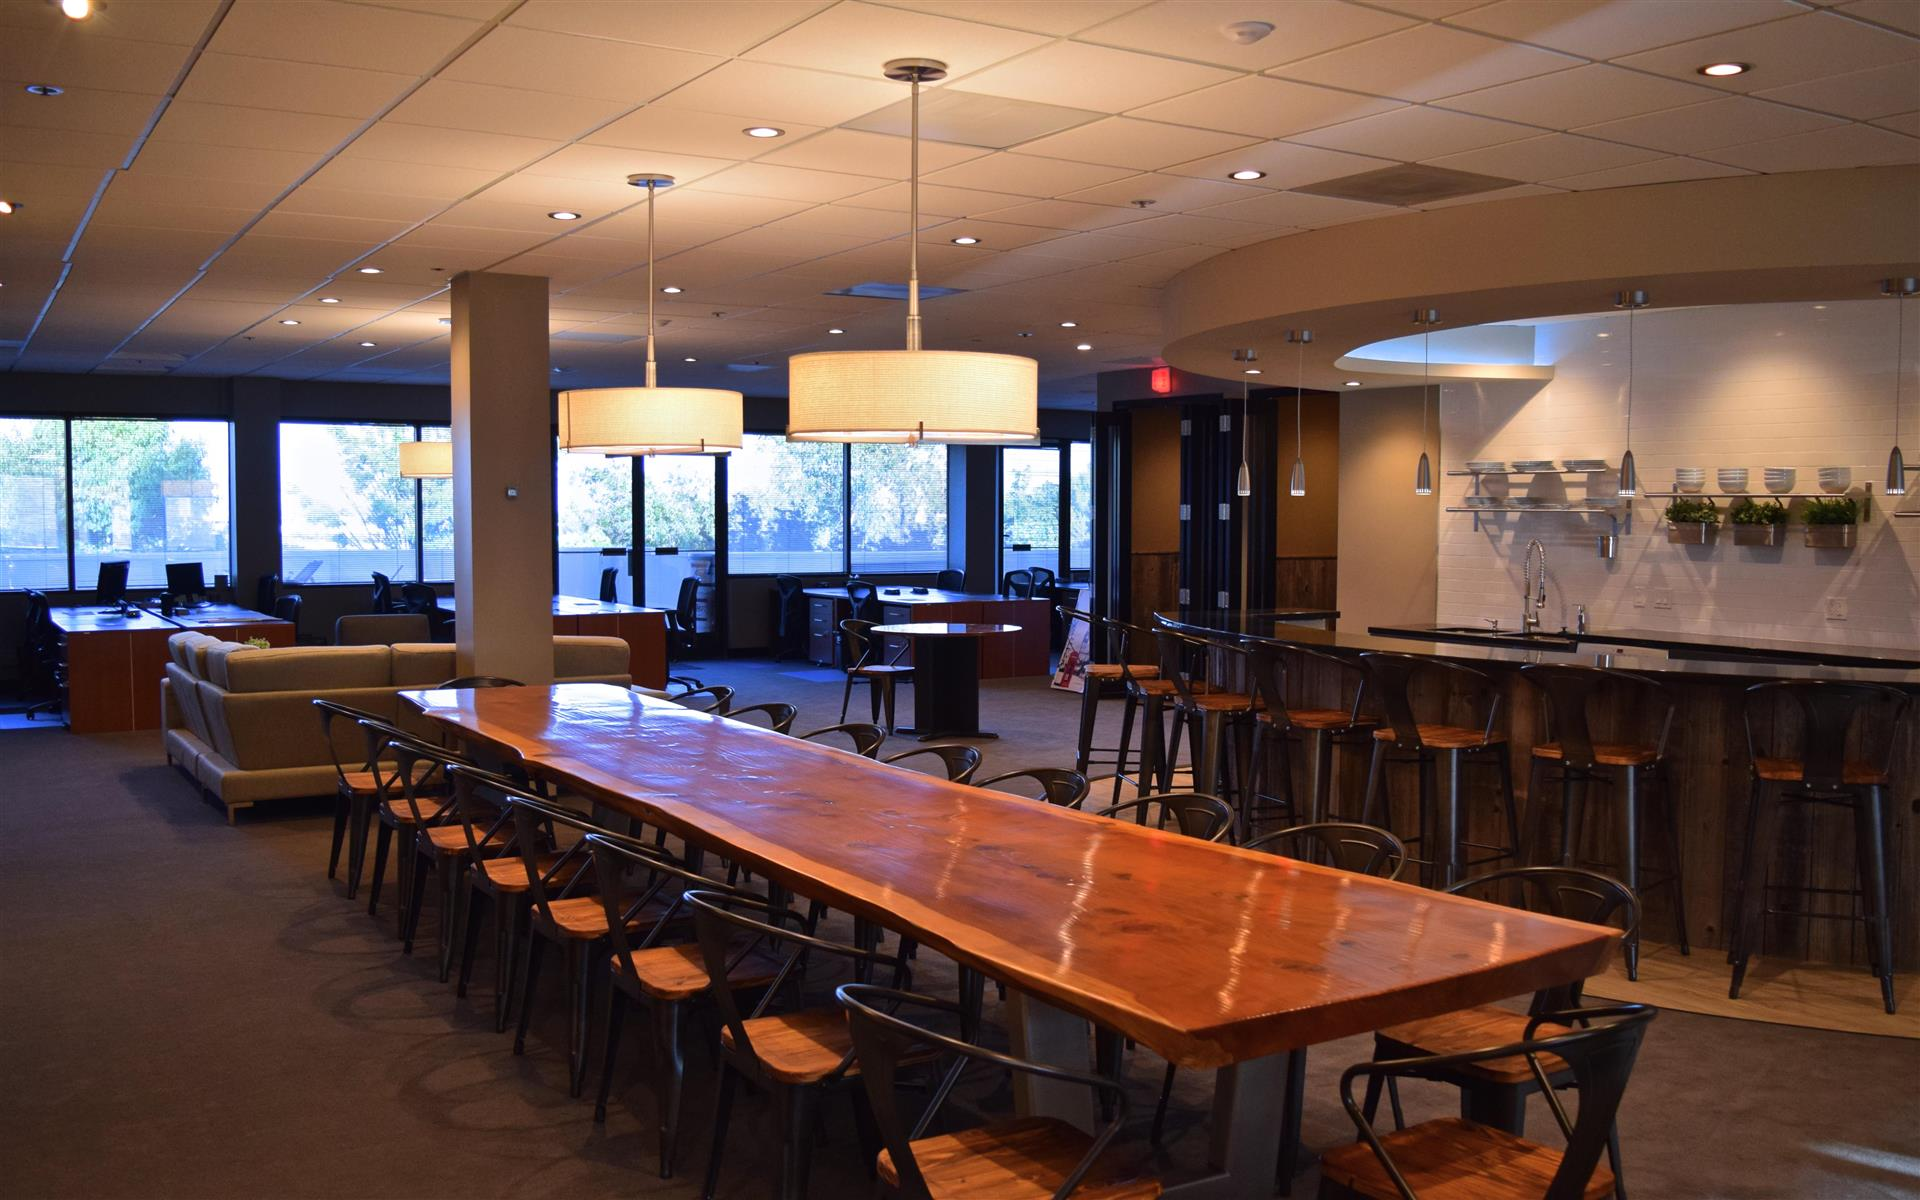 580 Executive Center - Hot Desks - Daily Cafe Memberships